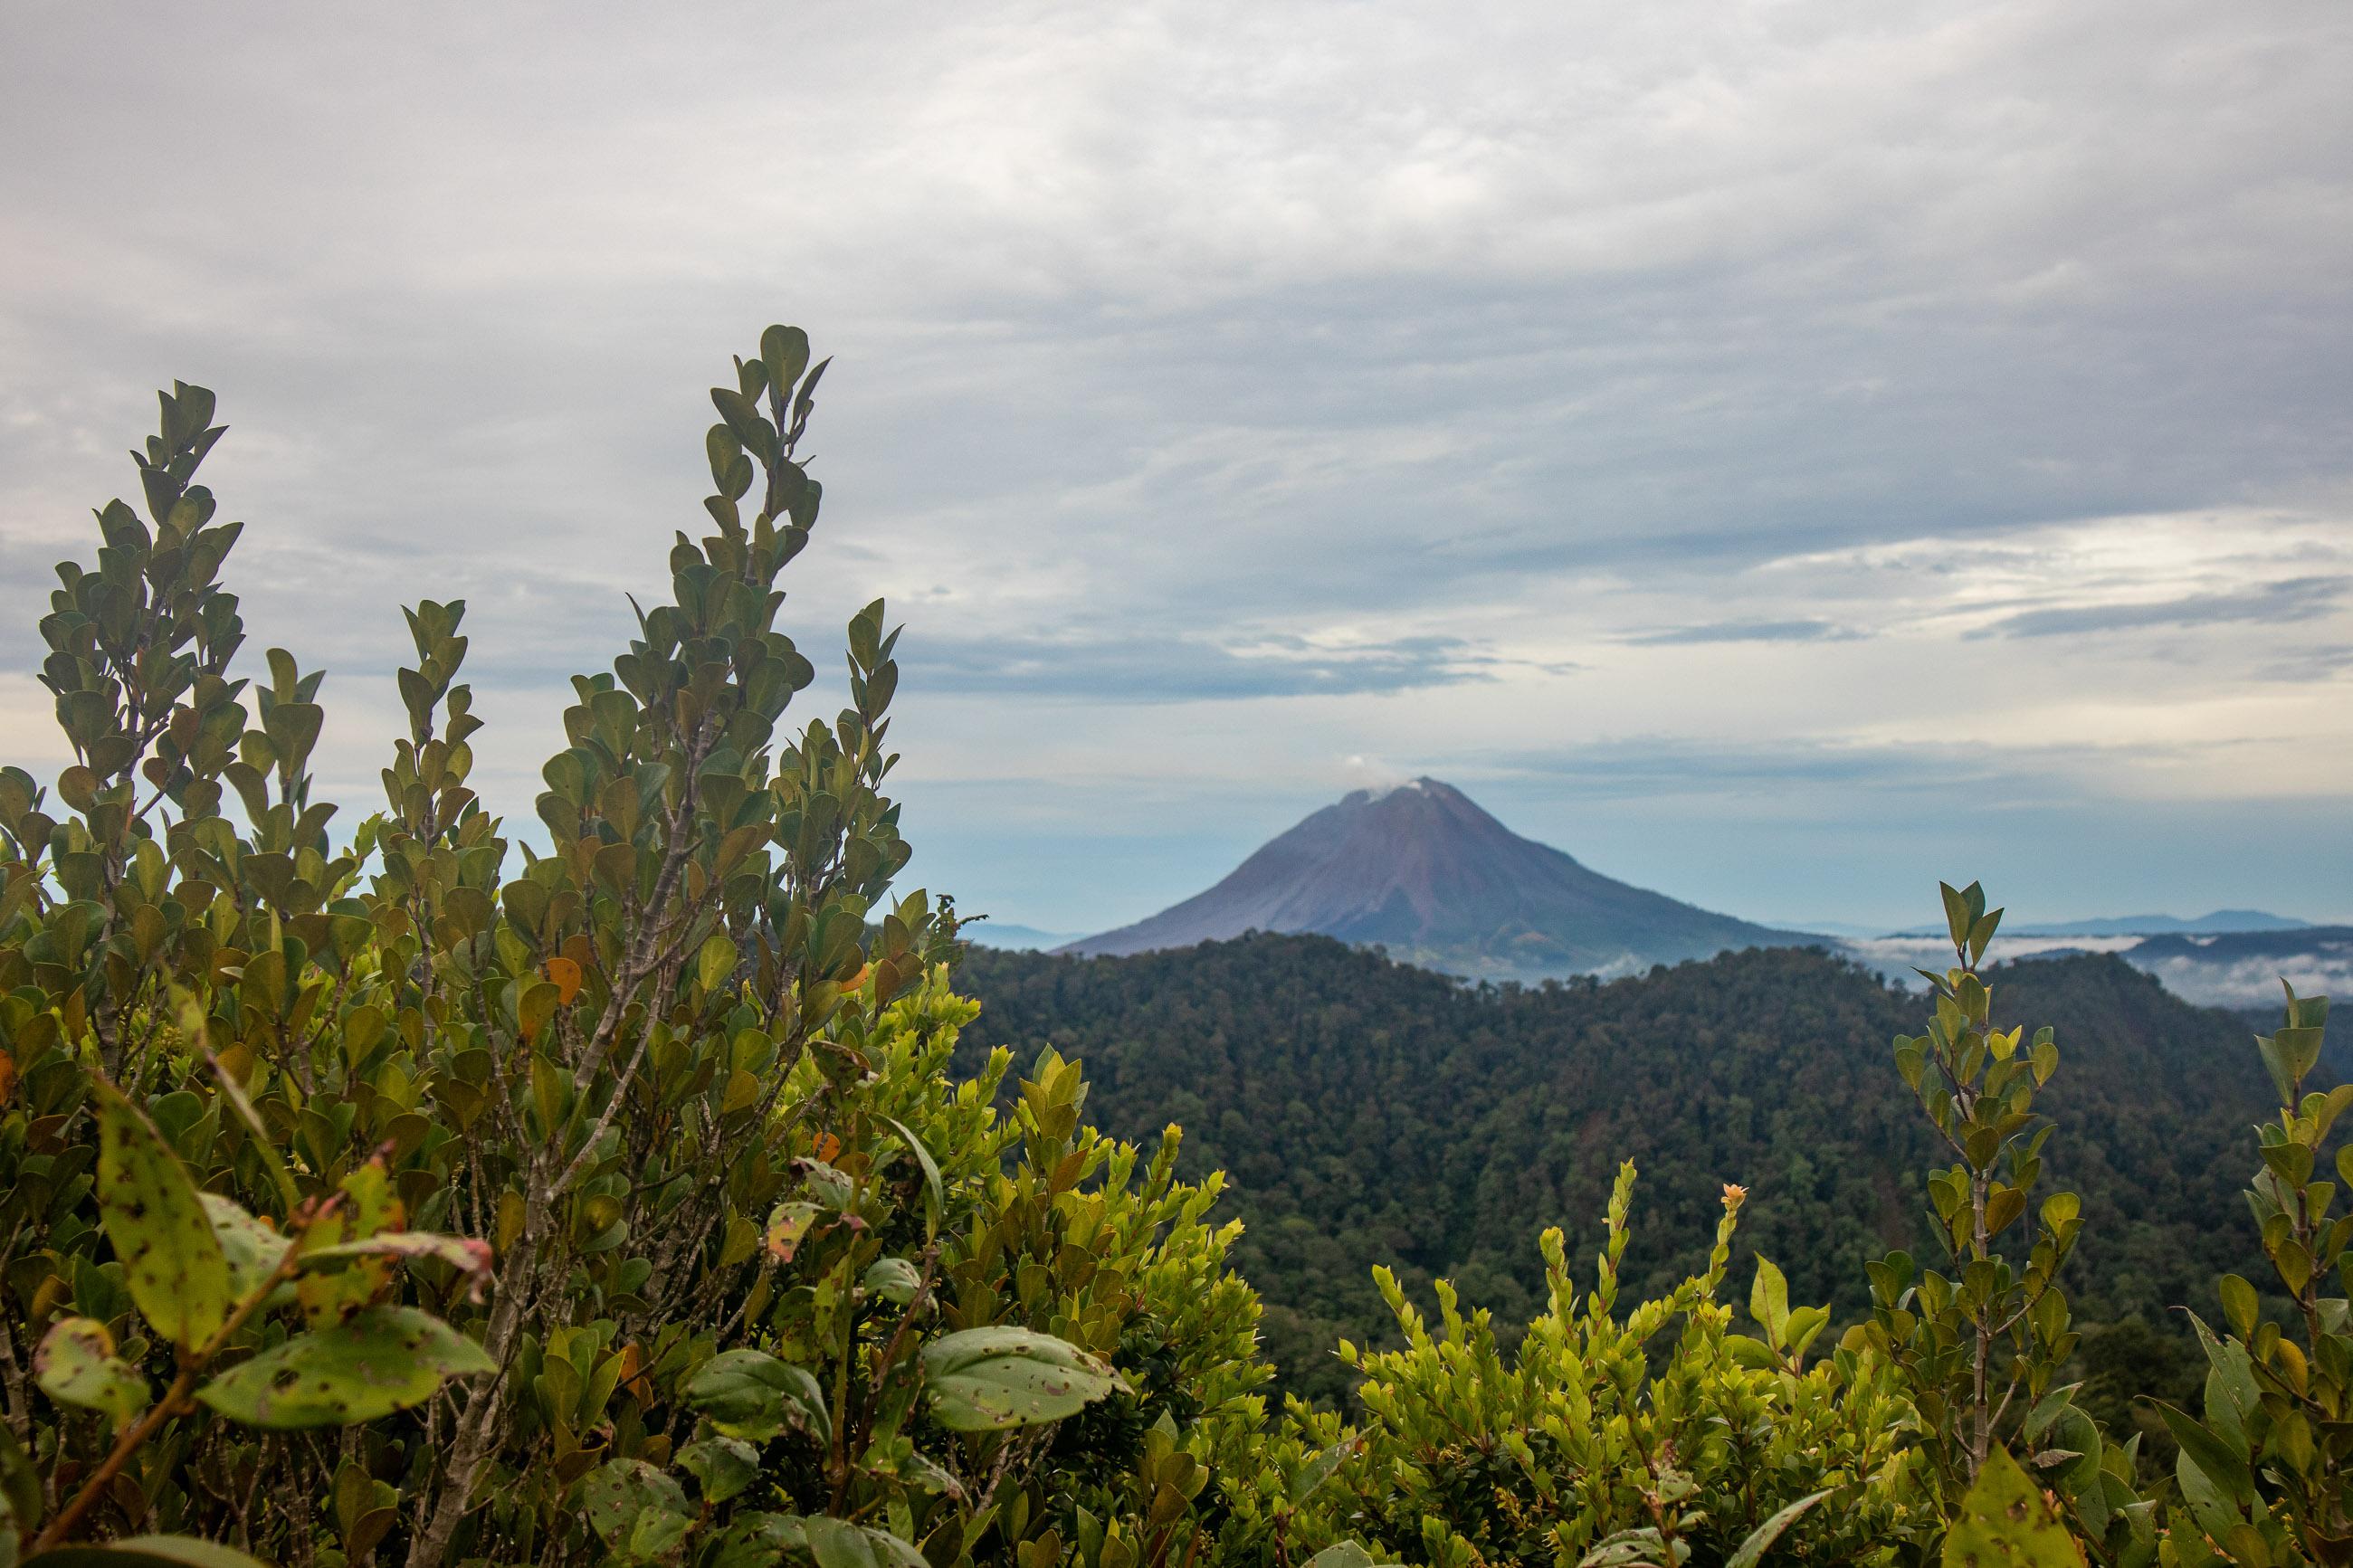 https://bubo.sk/uploads/galleries/7396/tomashornak_indonezia_sumatra_img_0149-1-28.jpg